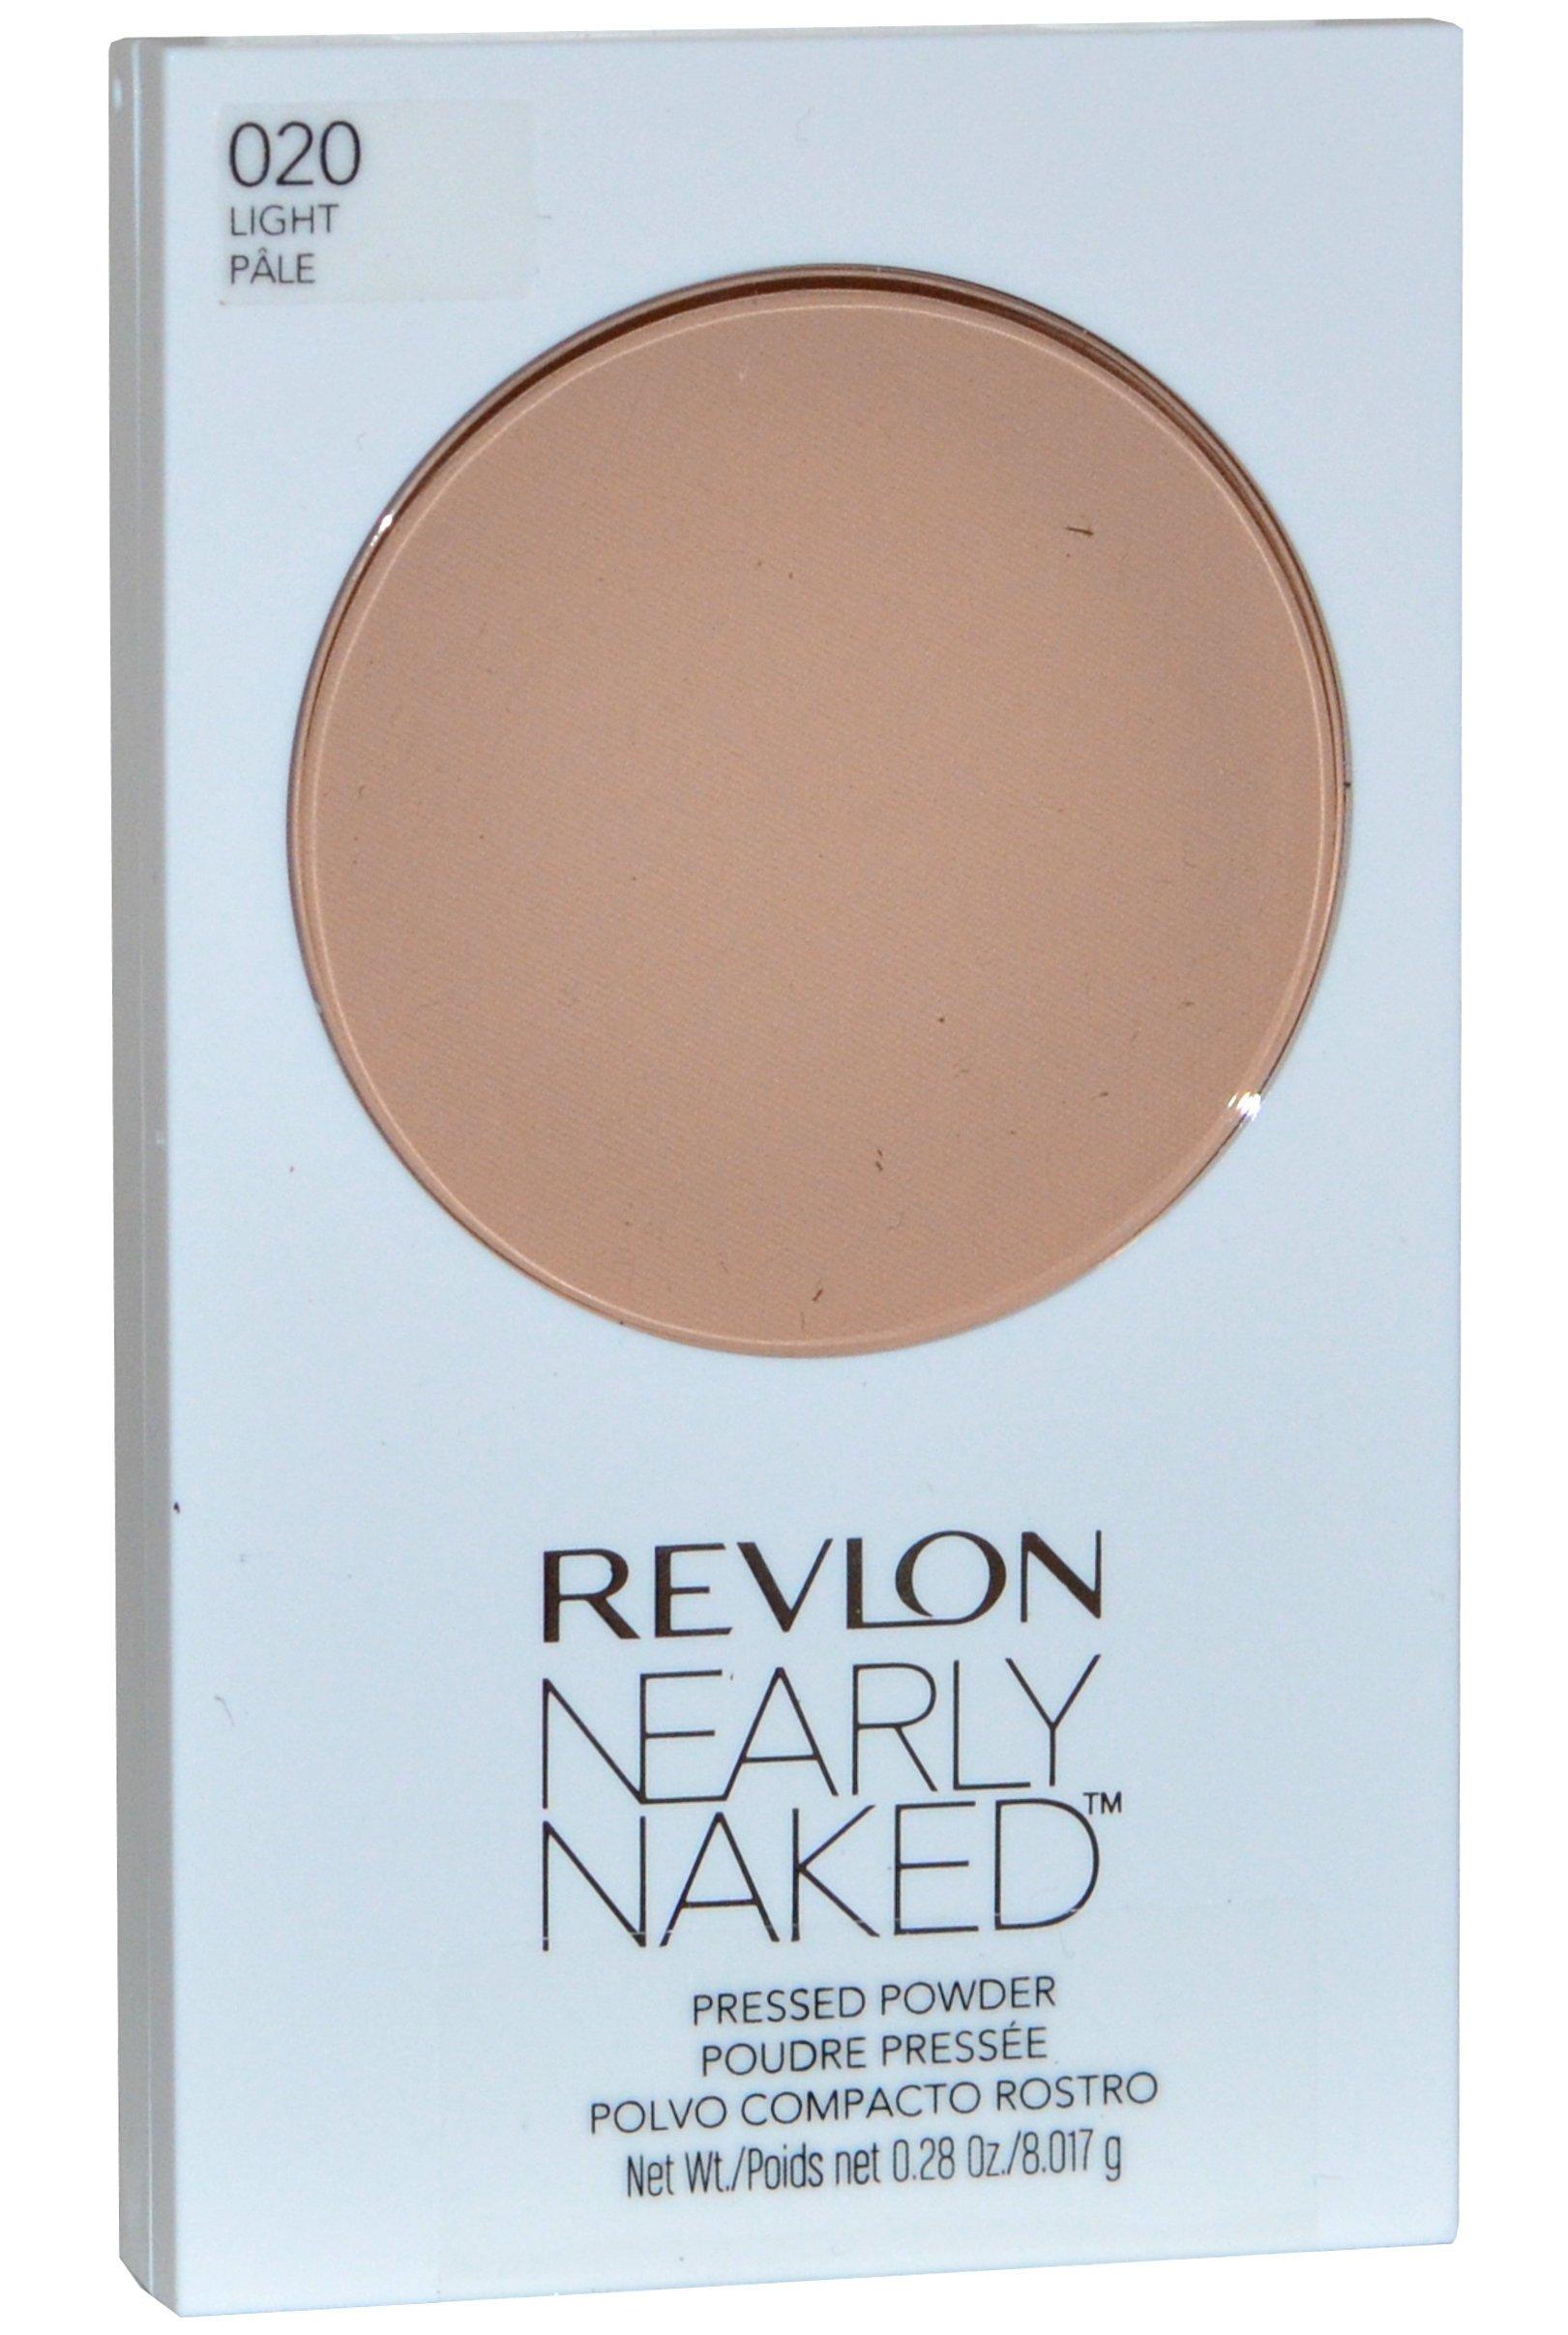 Revlon Compact Powder - Buy Revlon Nearly Naked Pressed